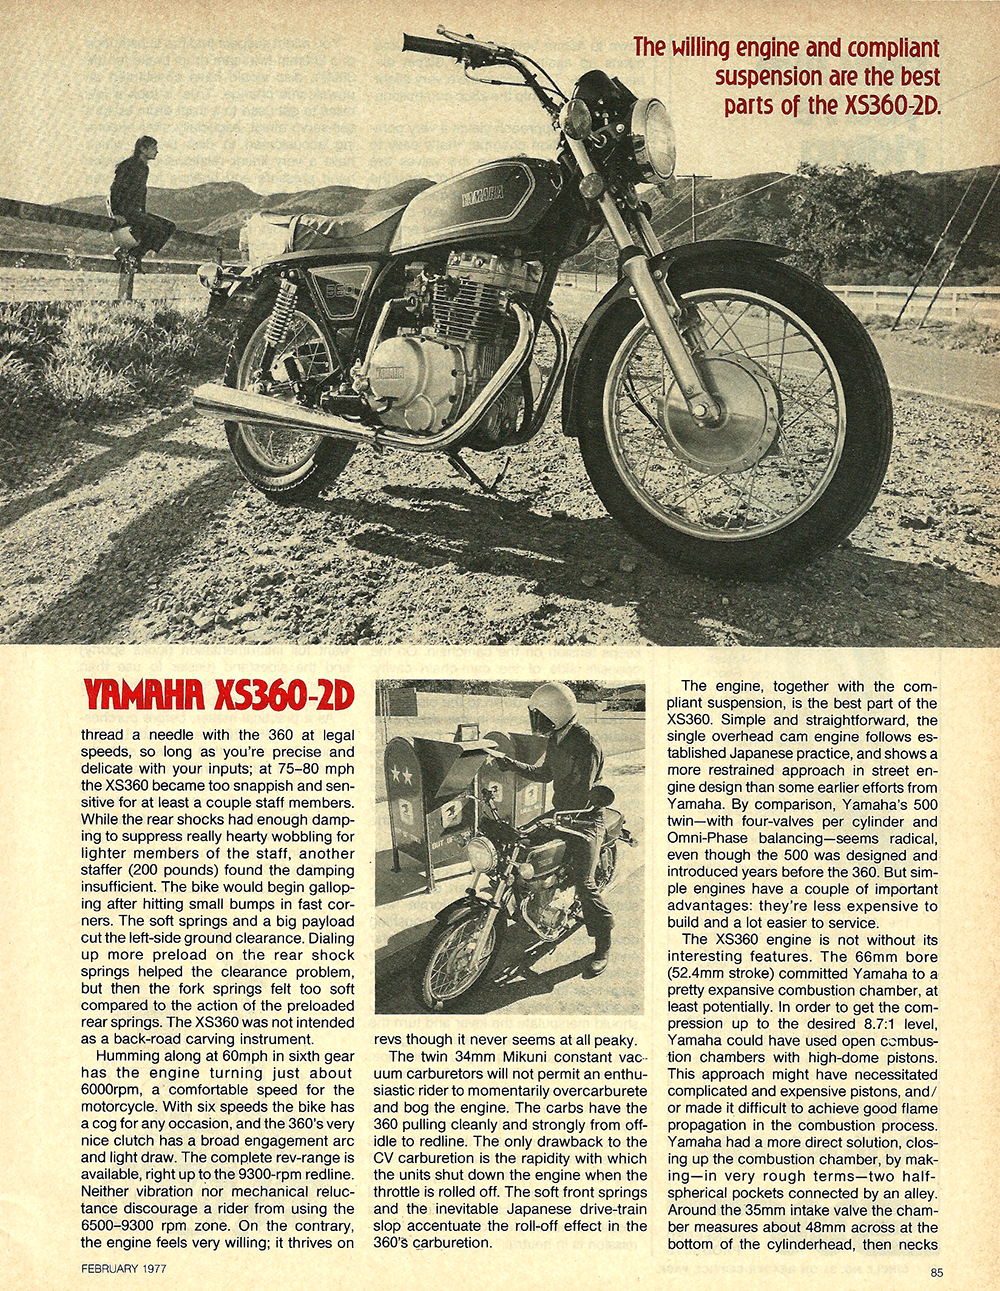 1977 Yamaha XS360-2D road test 5.jpg